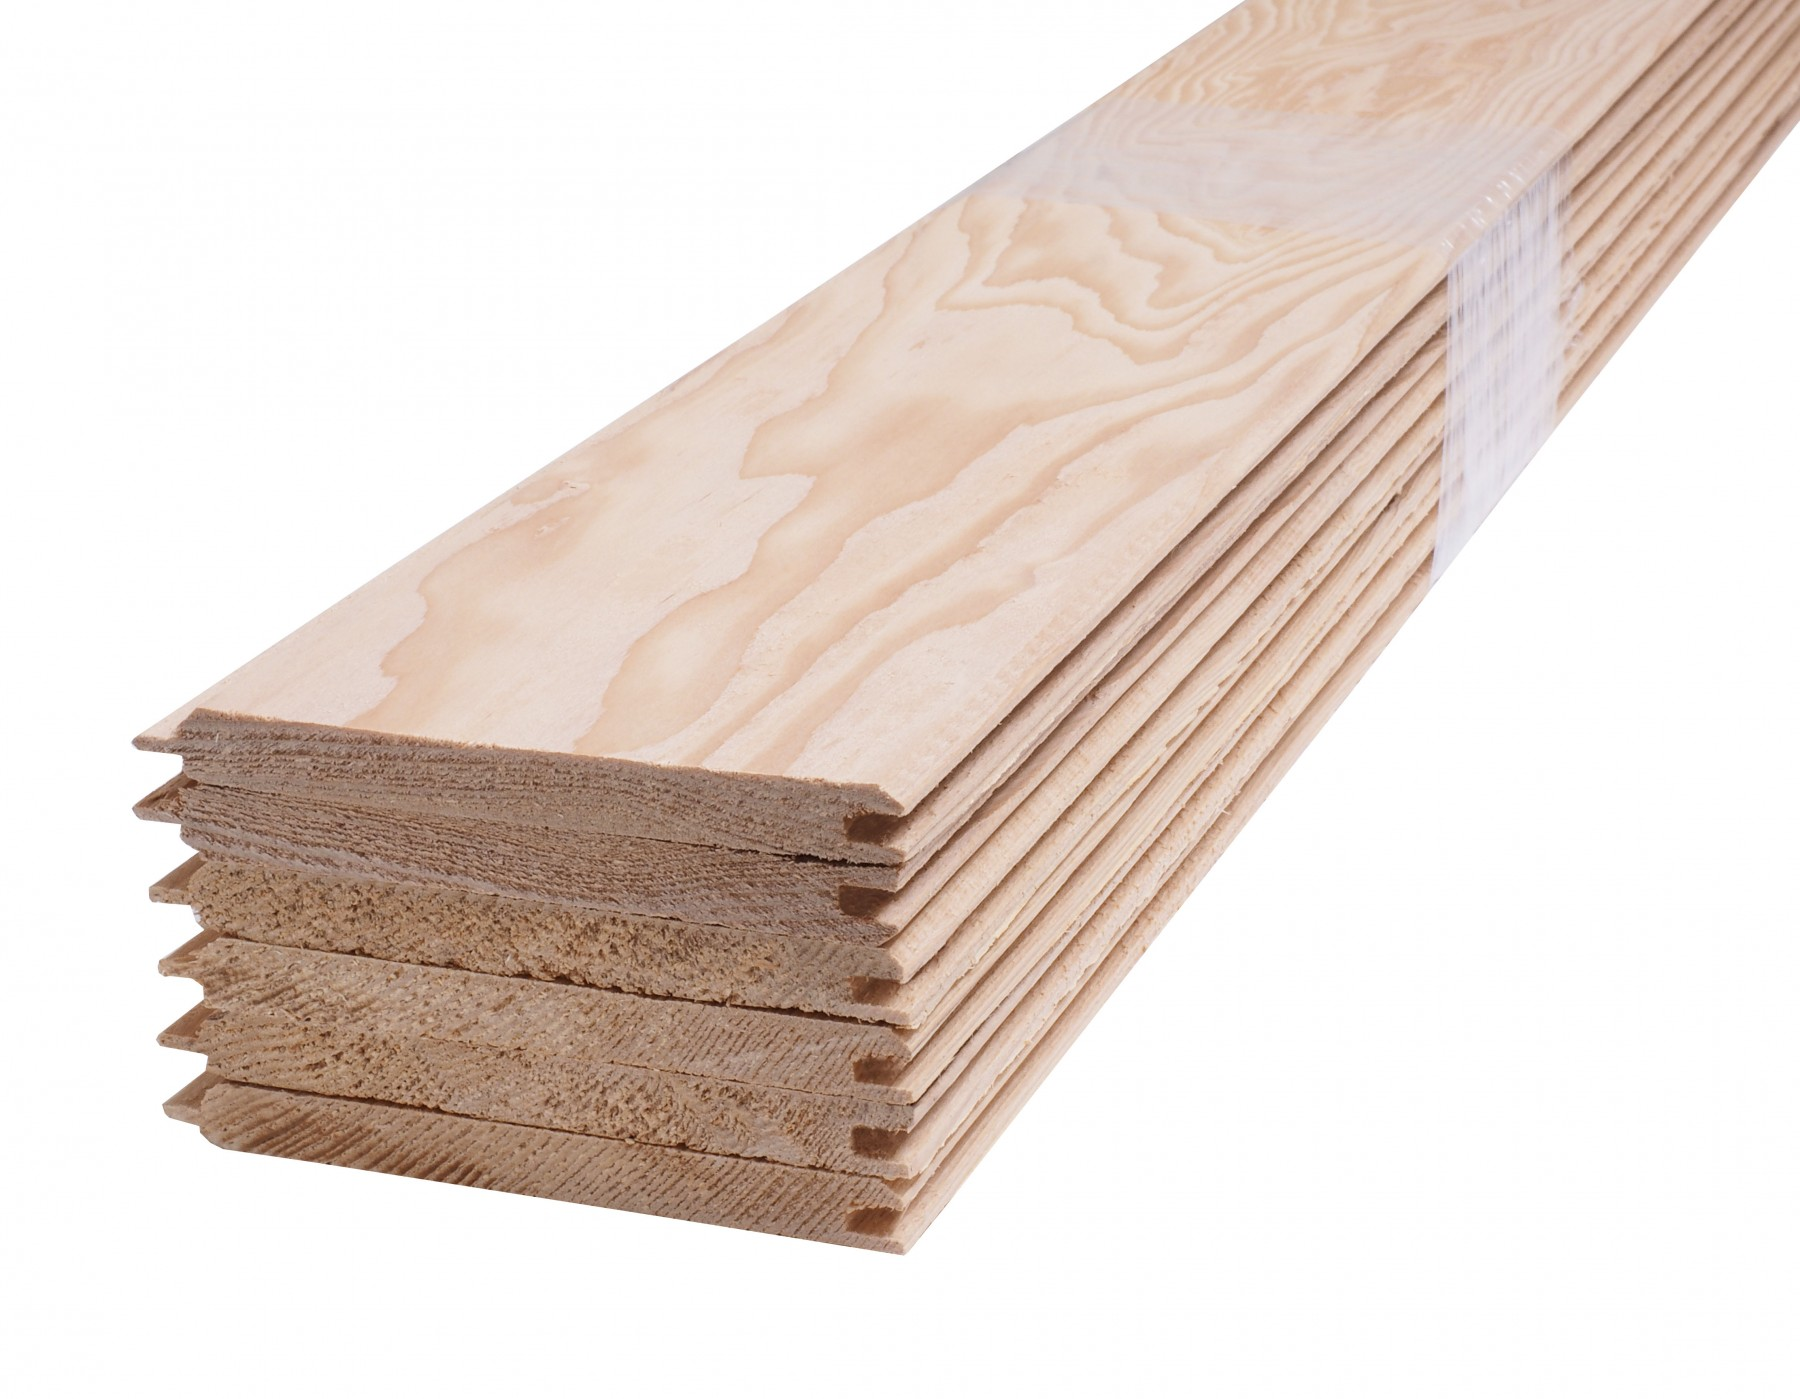 Construire Un Sauna Finlandais lambris traditionnel en bois hemlock – 9mm